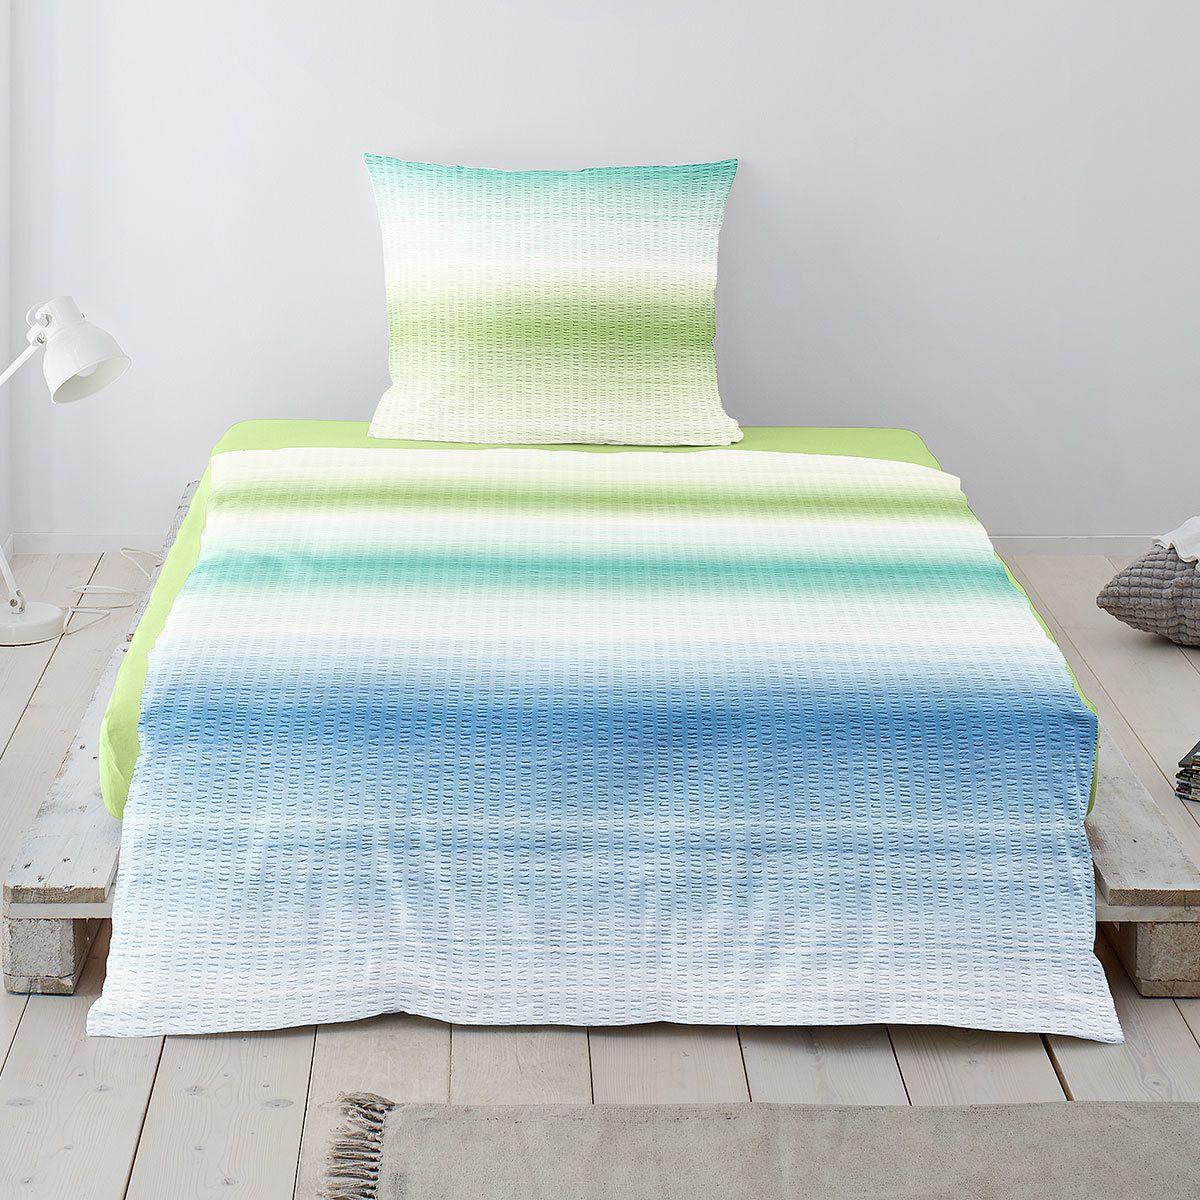 irisette white irisette by with irisette finest weitere with irisette excellent irisette. Black Bedroom Furniture Sets. Home Design Ideas